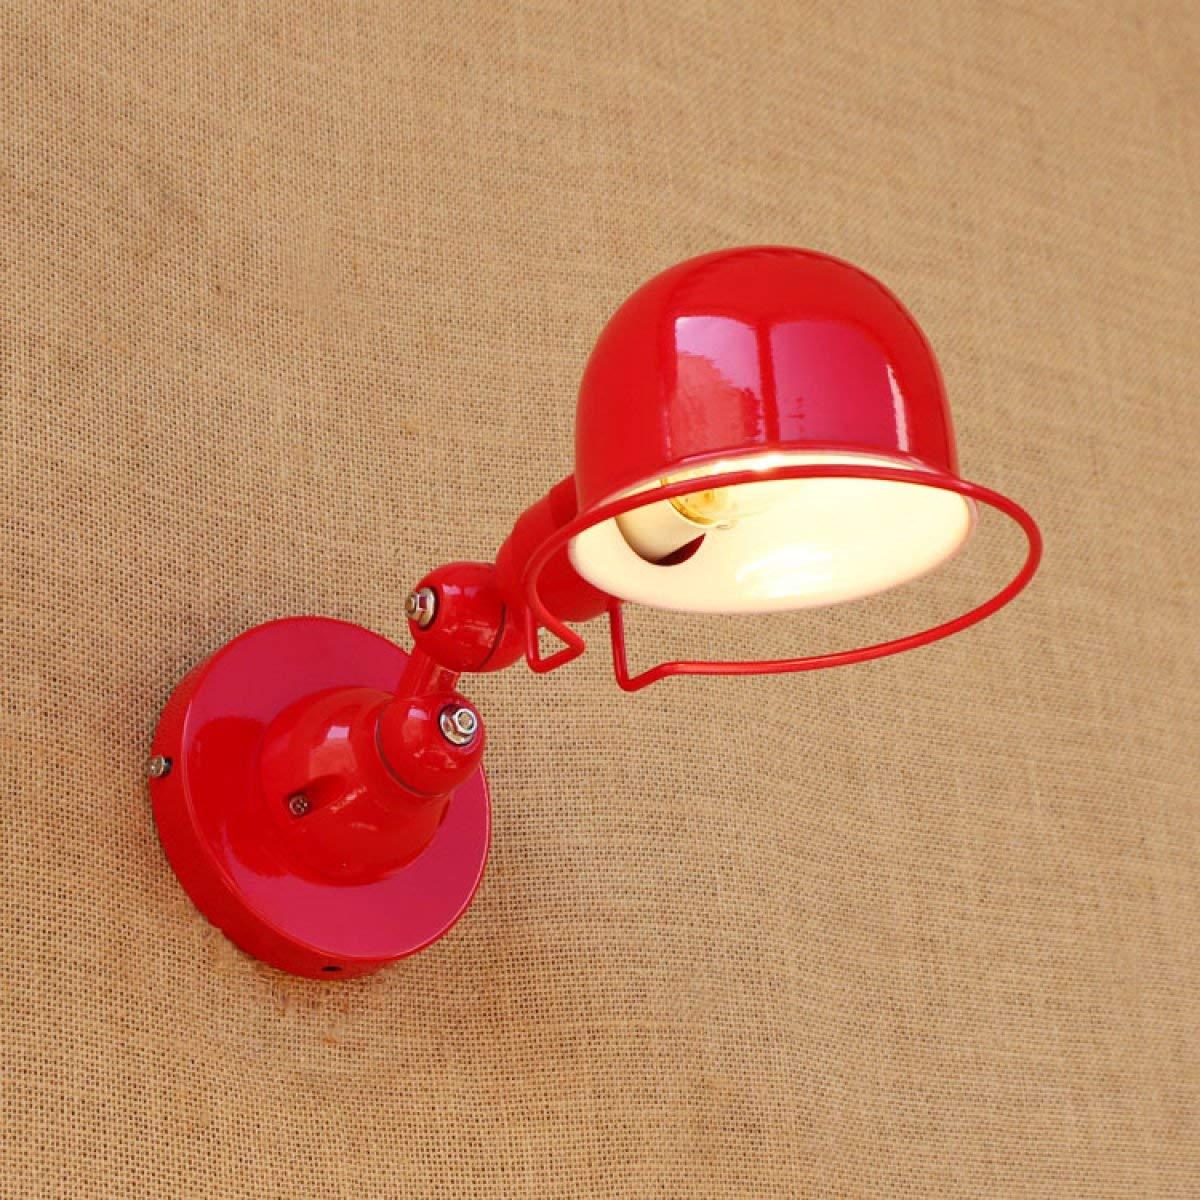 BXJ レトロ産業風クリエイティブ人格壁ライトアメリカンカフェ通路通路鉄装飾壁ランプ B07R4DR8NM